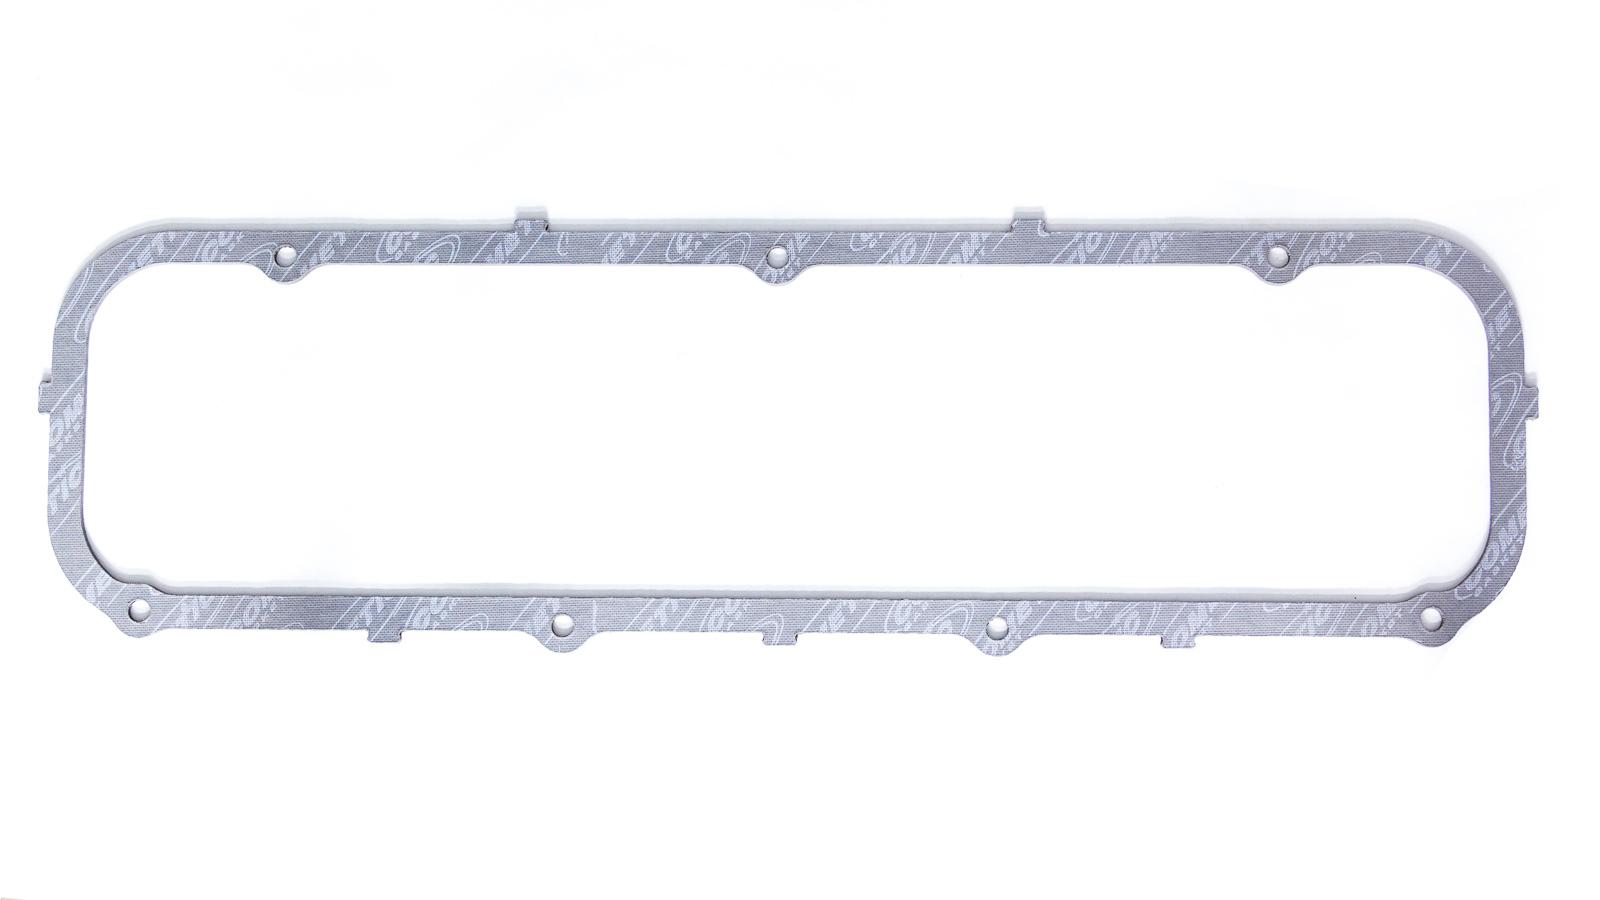 Valve Cover Gasket (1pc) BBF 429/460